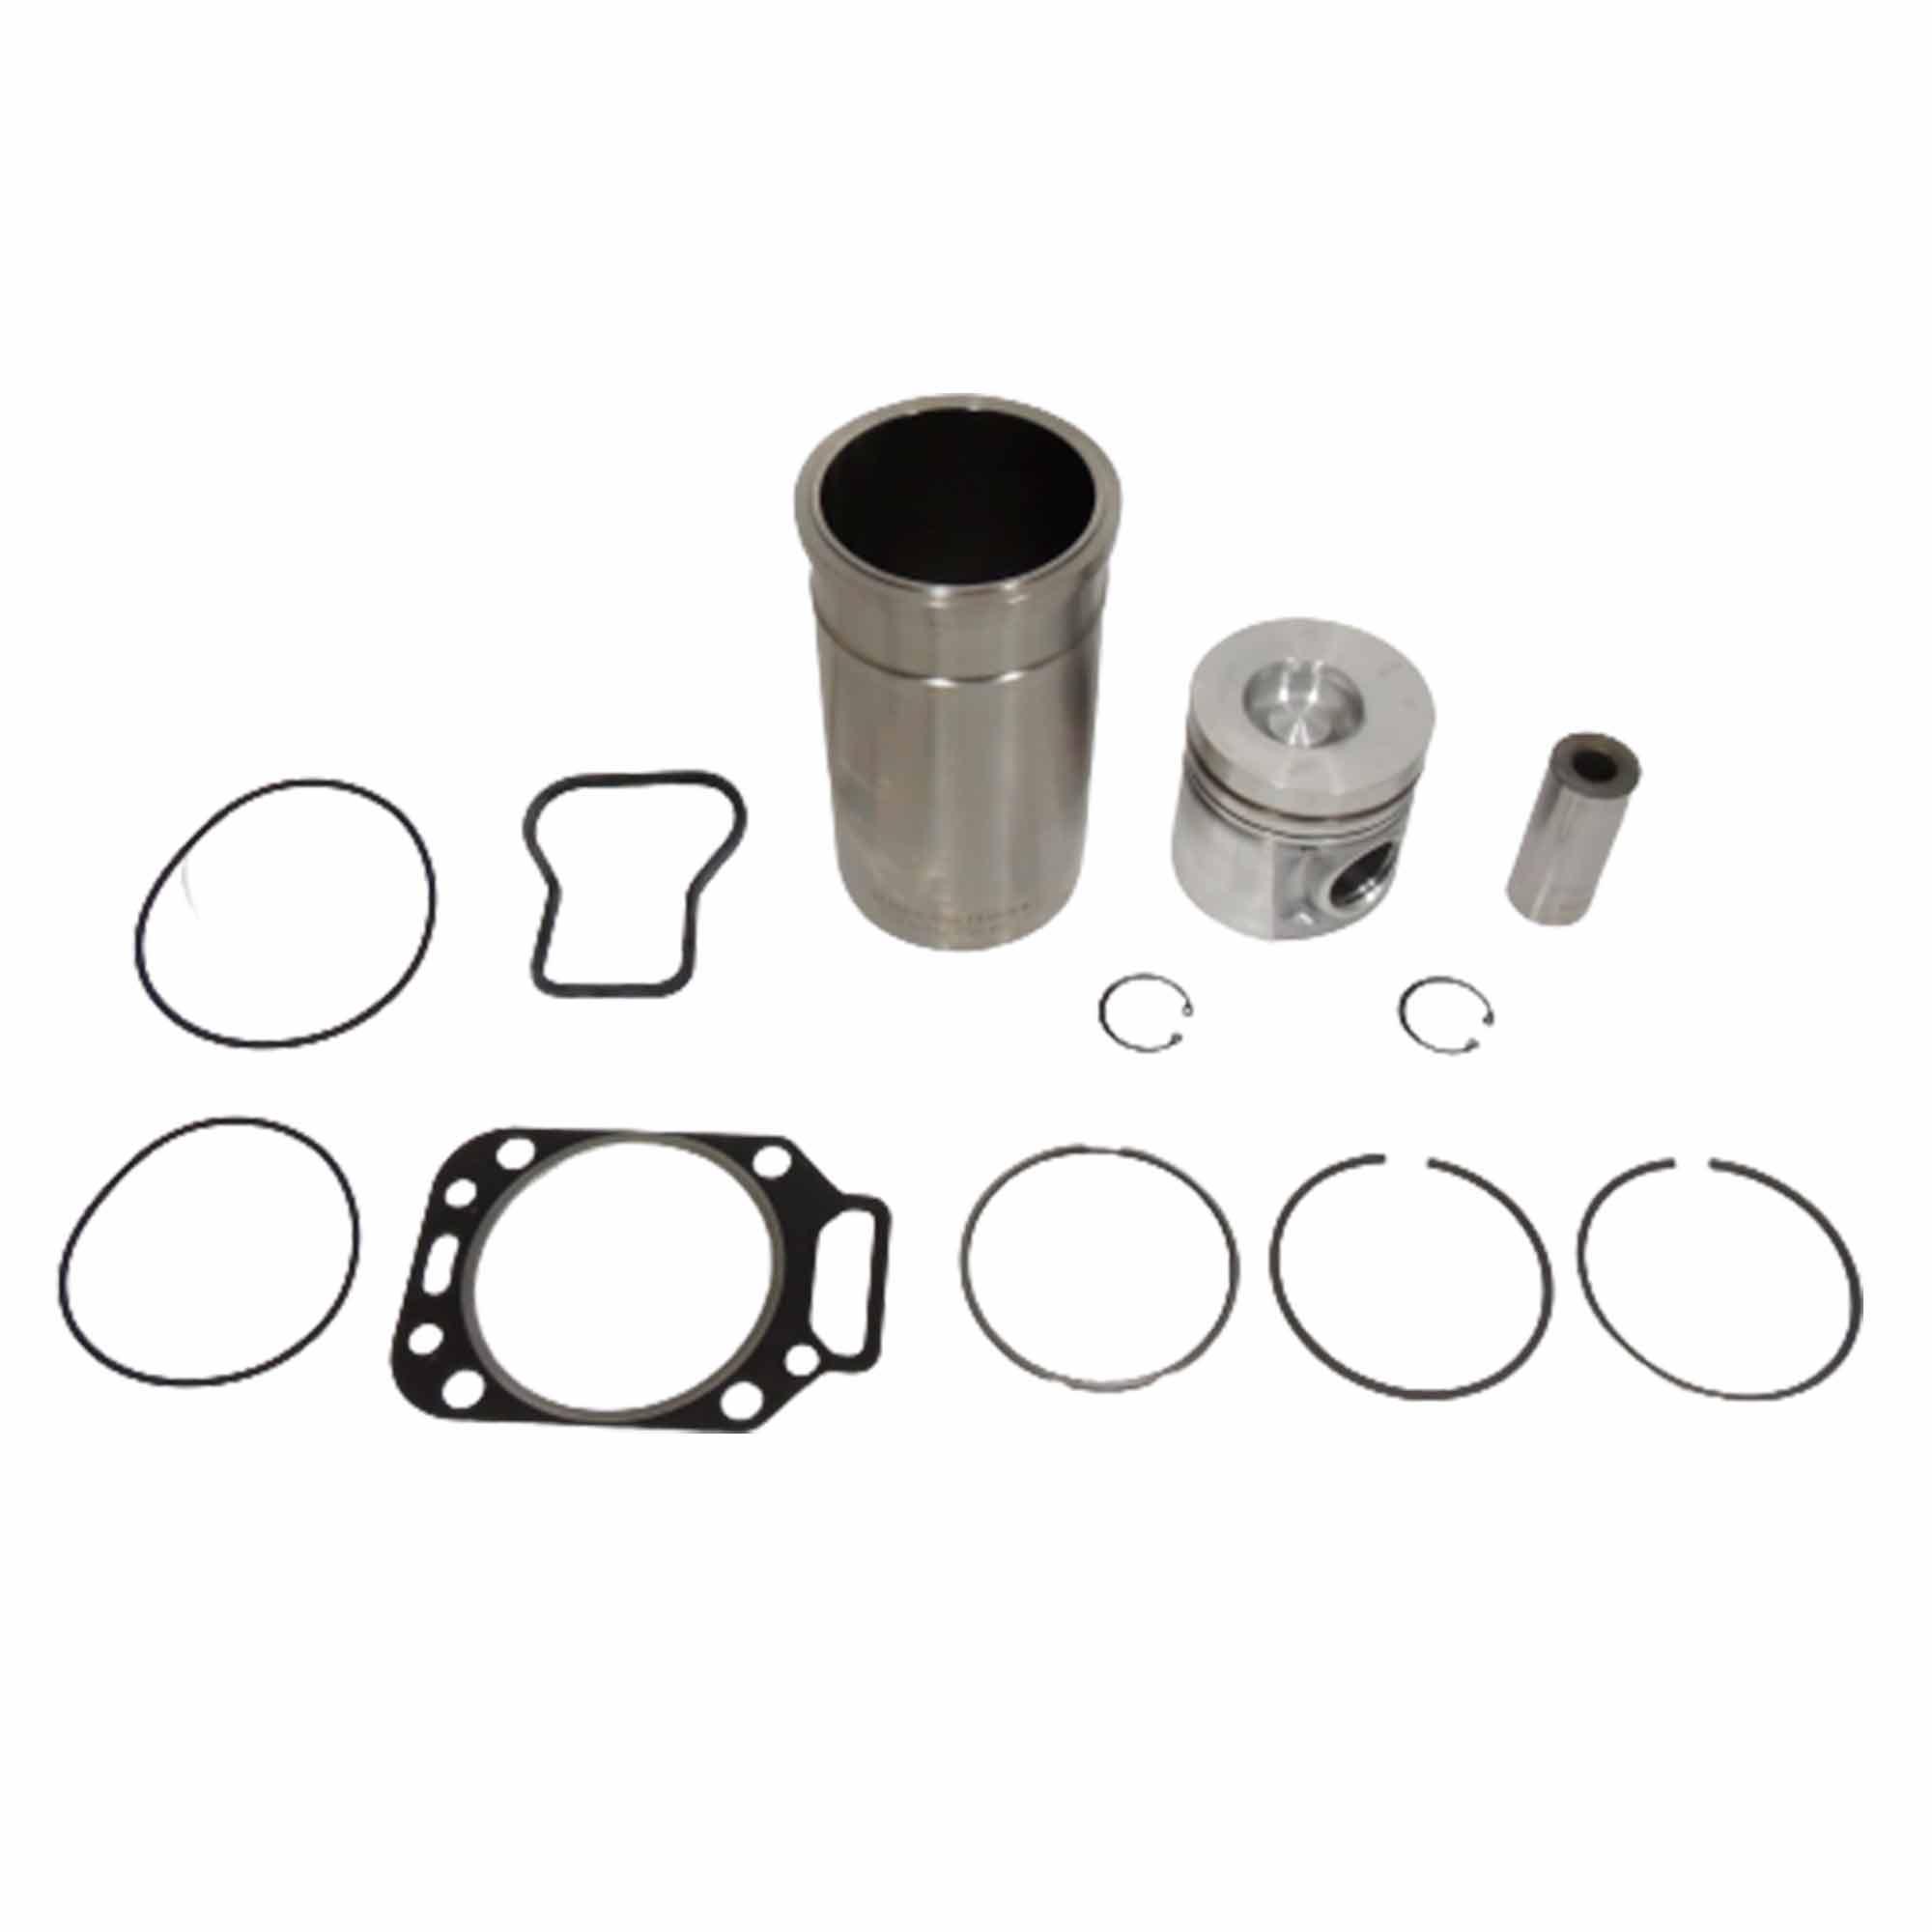 961080191178 - Kit de reparo para 1 cilindro